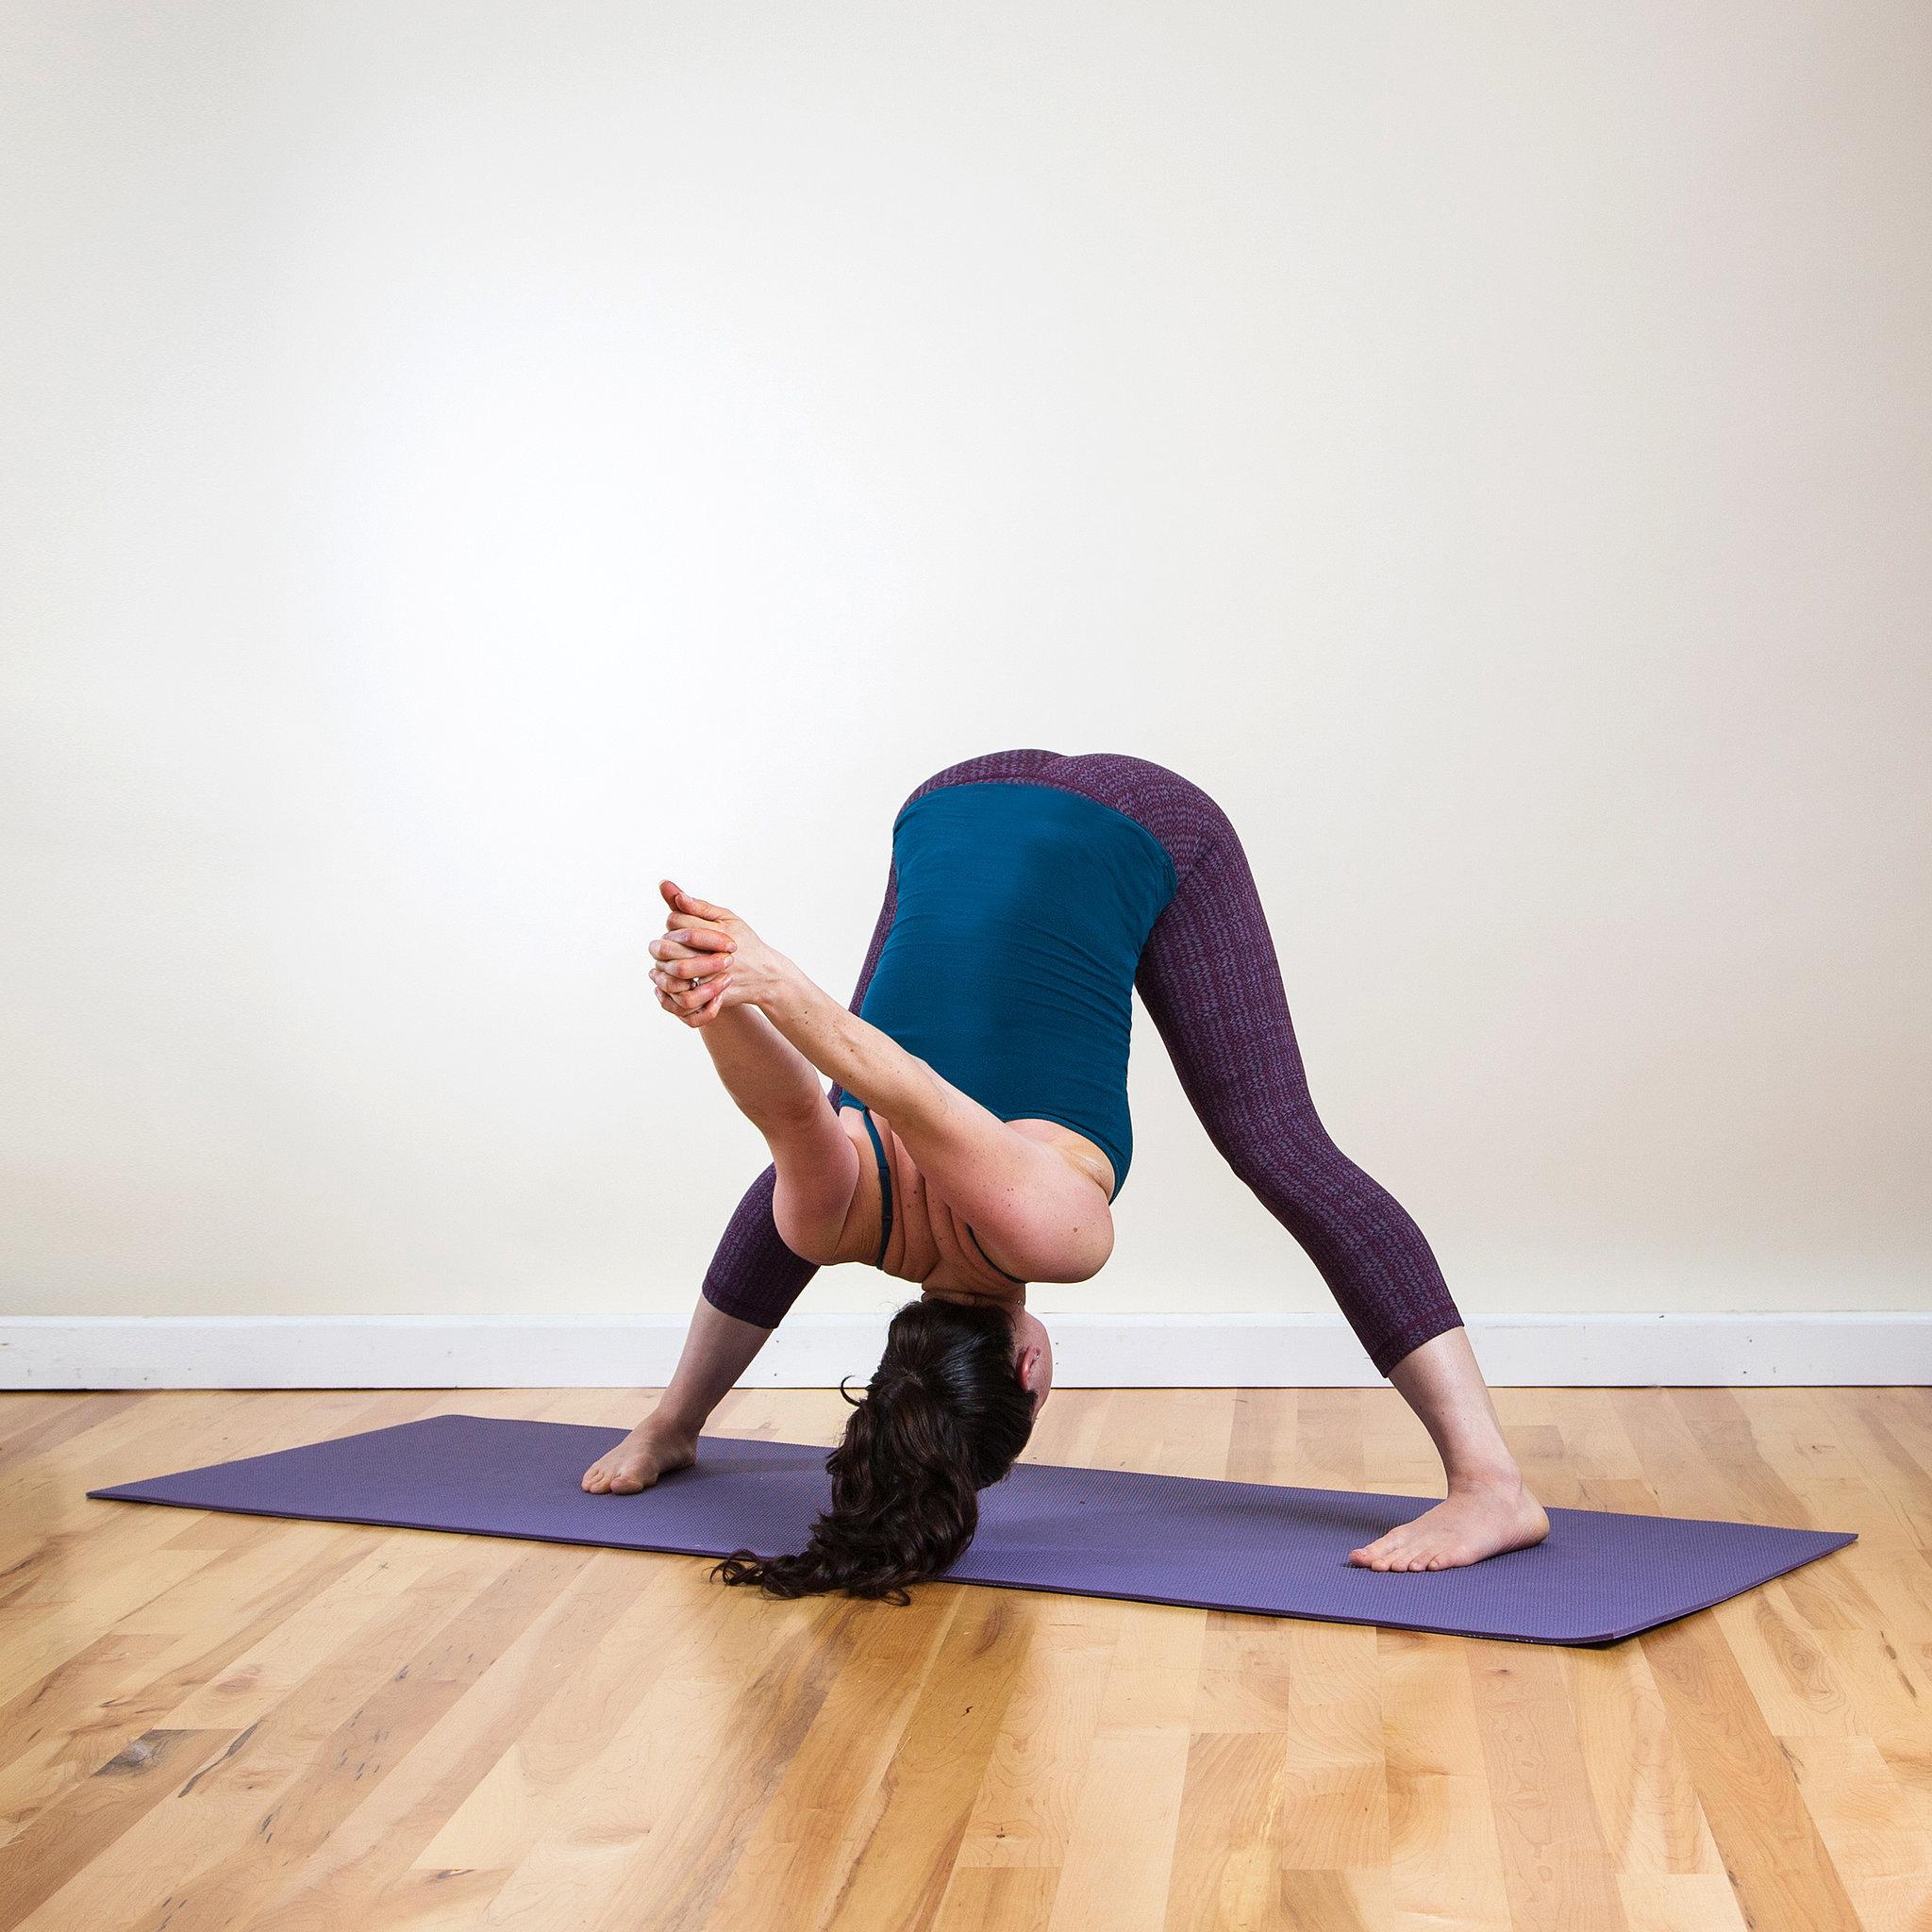 Yoga Pose 1: Wide-Legged Forward Bend C